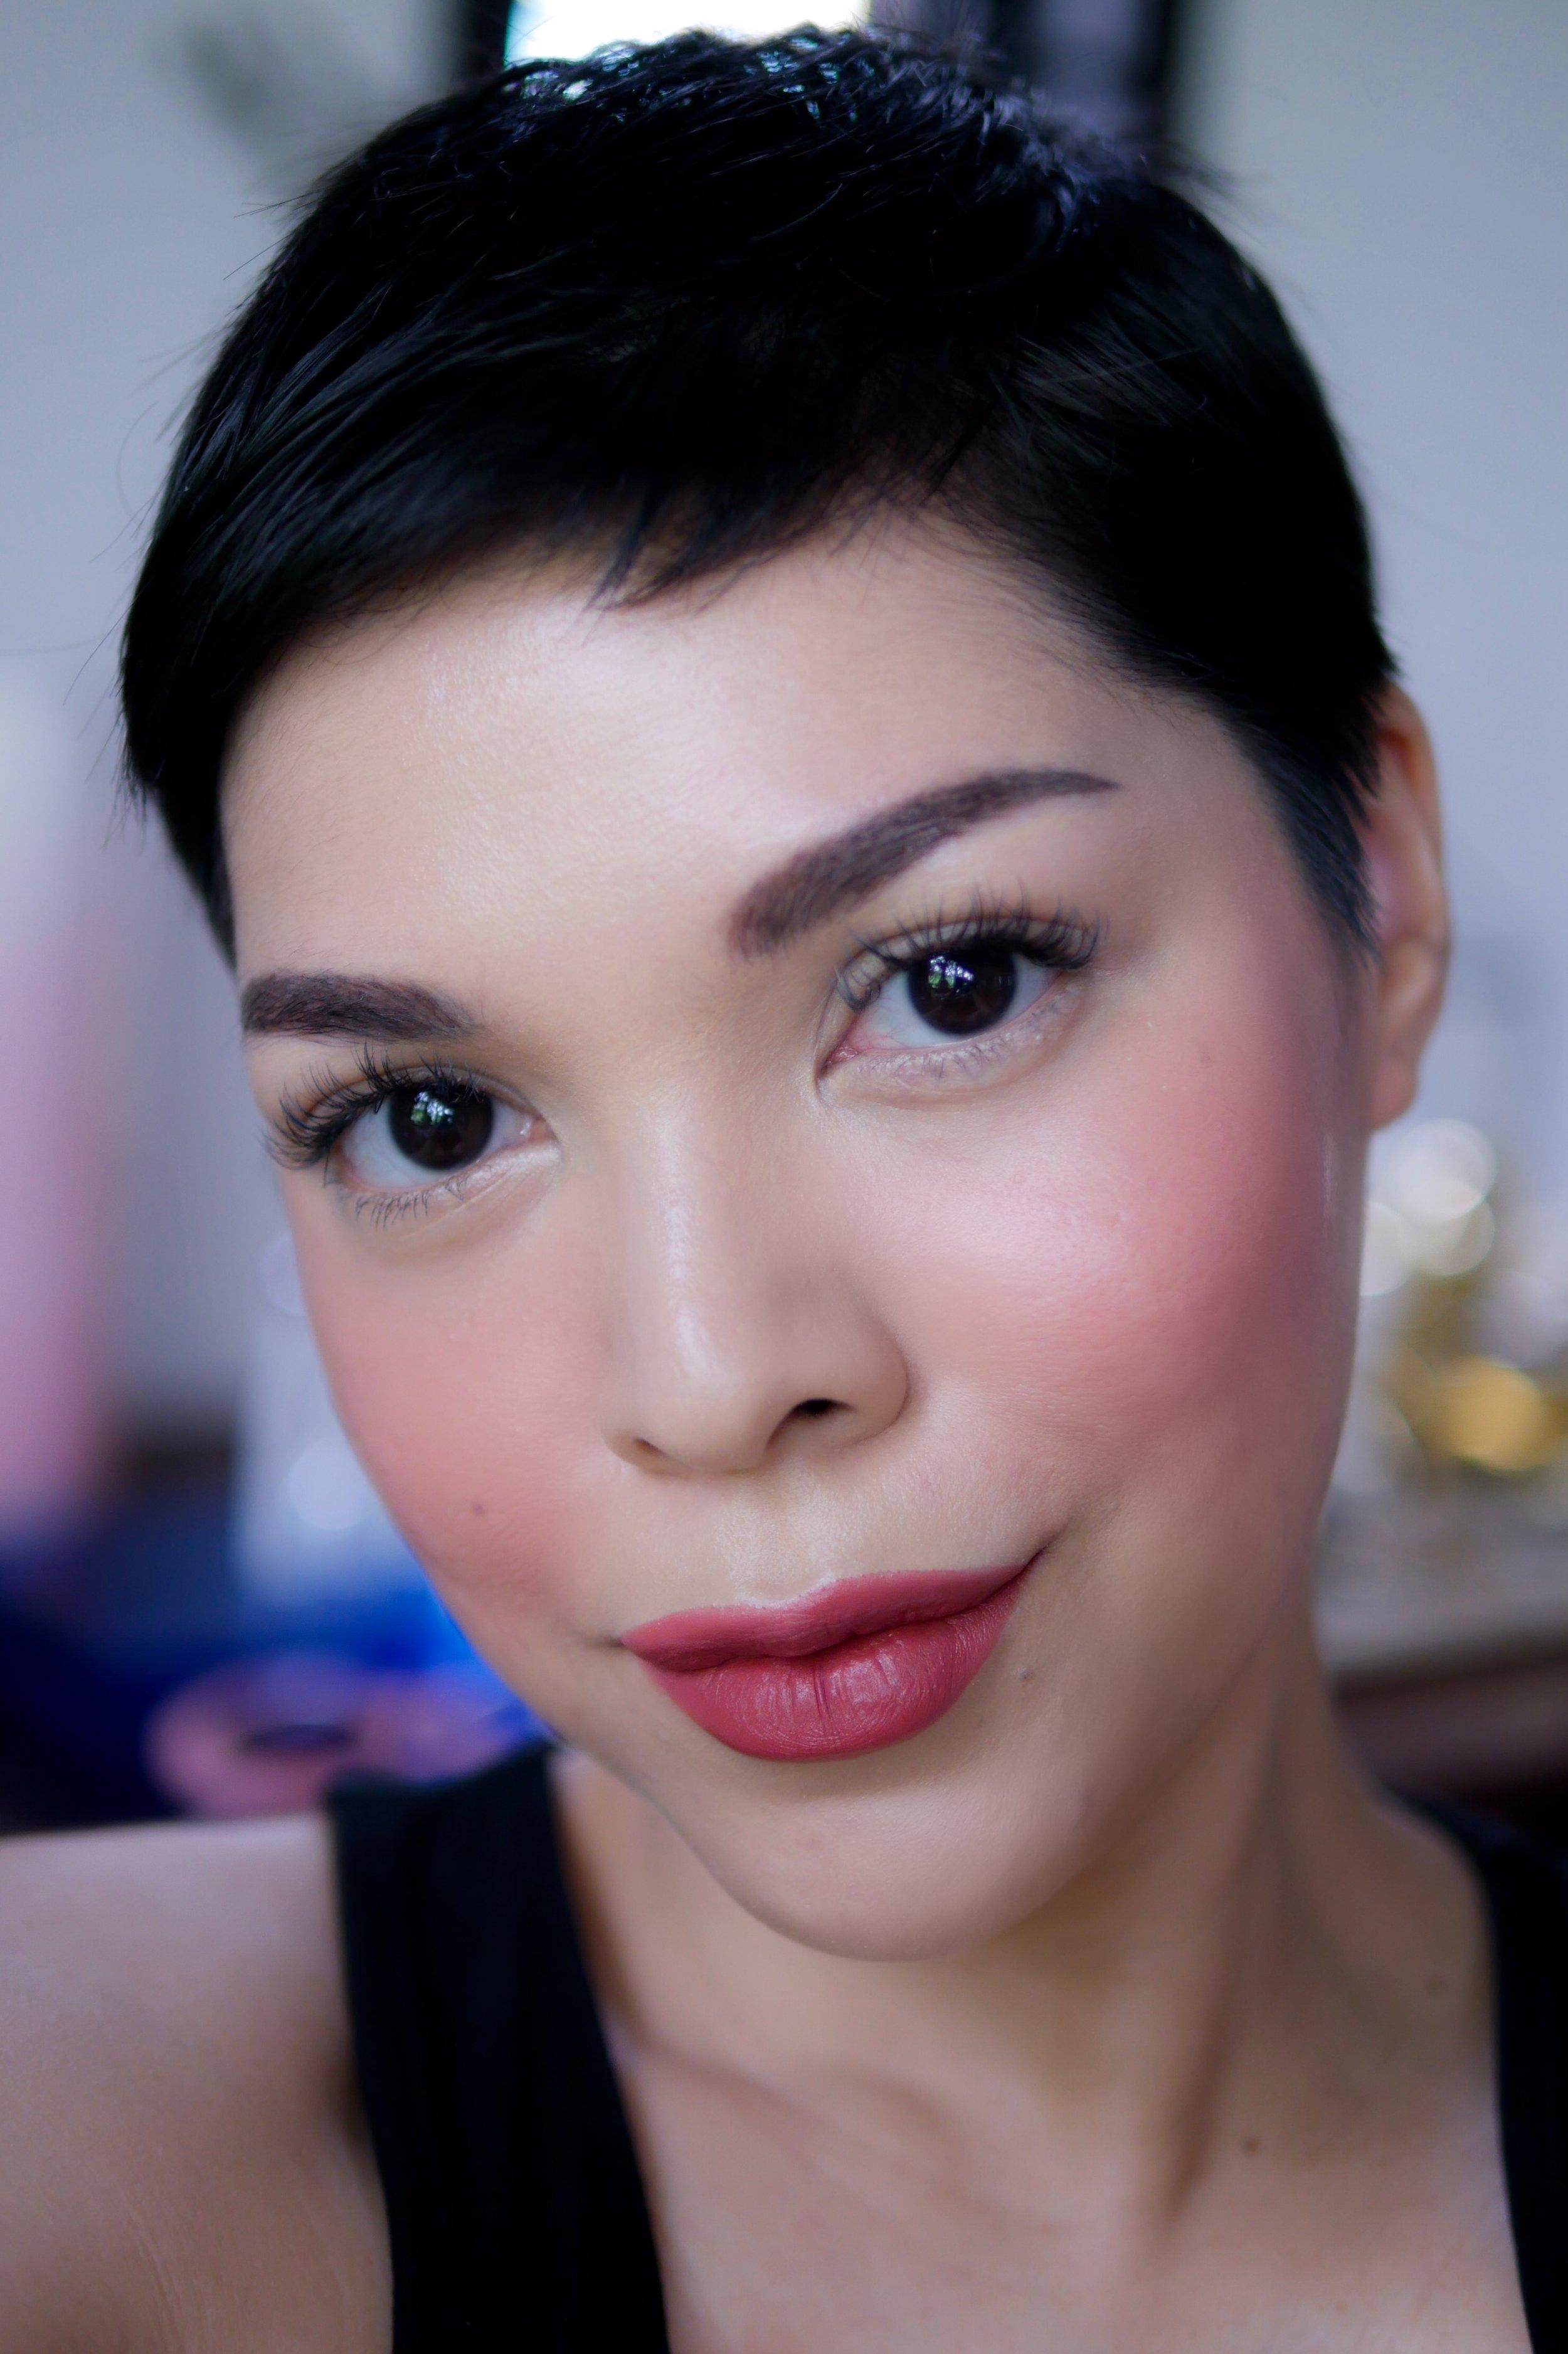 Pipi dan bibir menggunakan  Trope Velvet Matte Lipstick   shade   No.03 Peony .